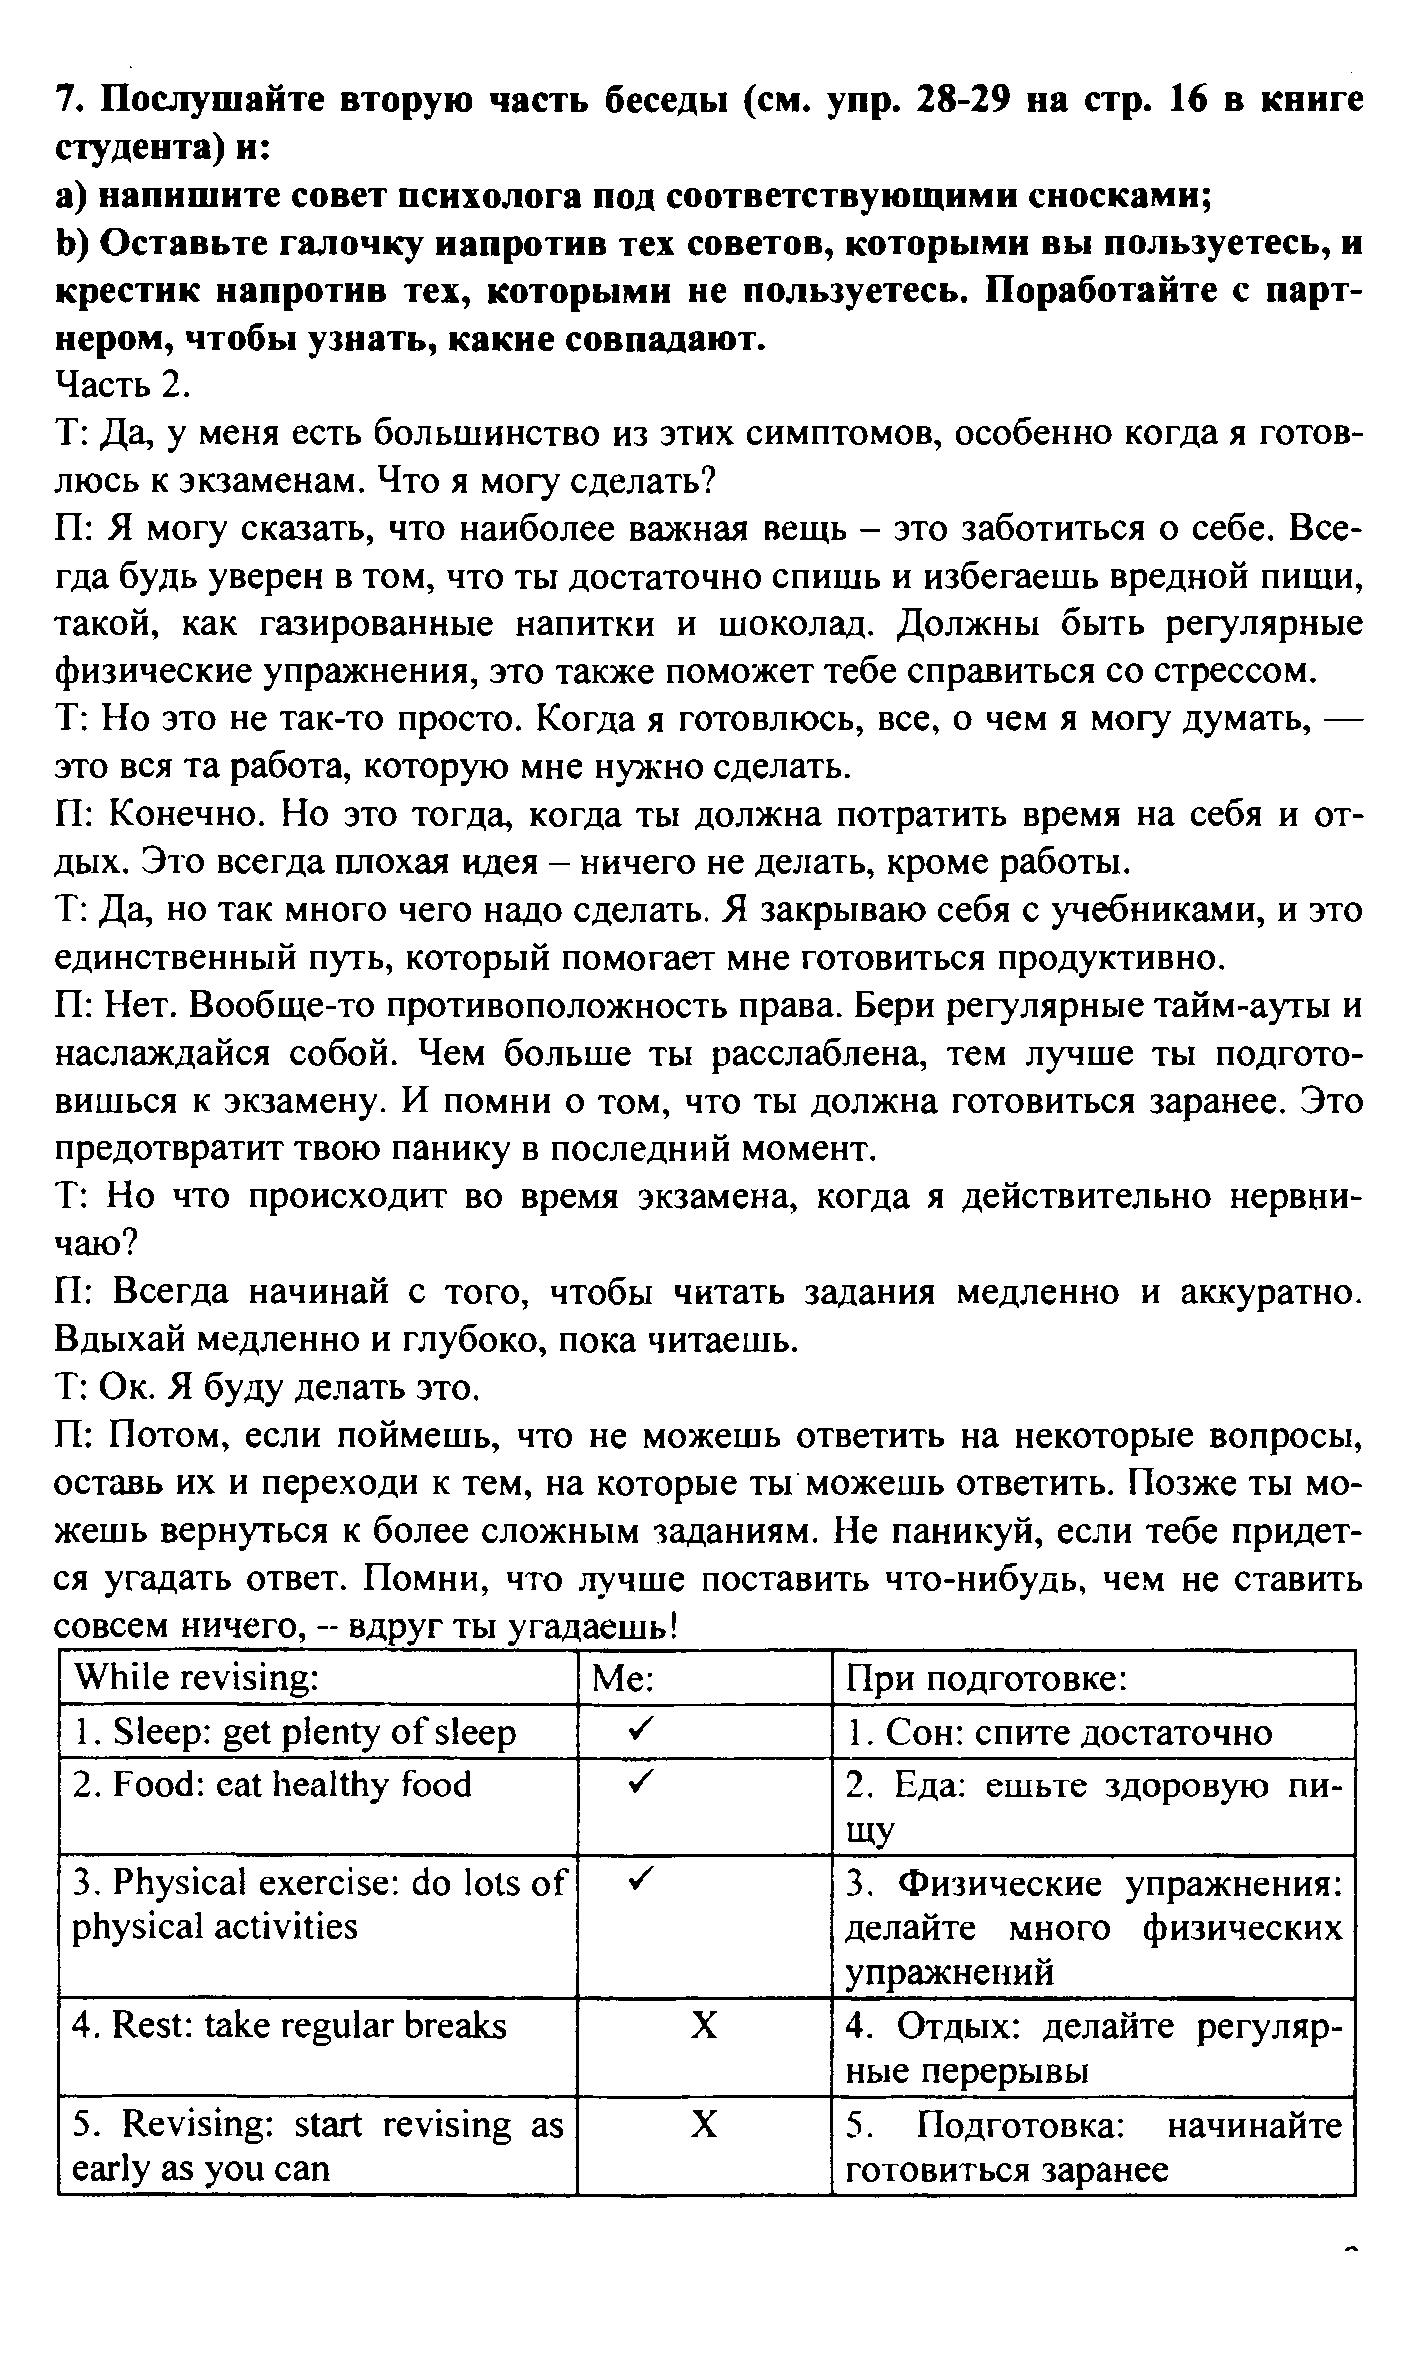 Гдз литература 5 класс исаева сафарян